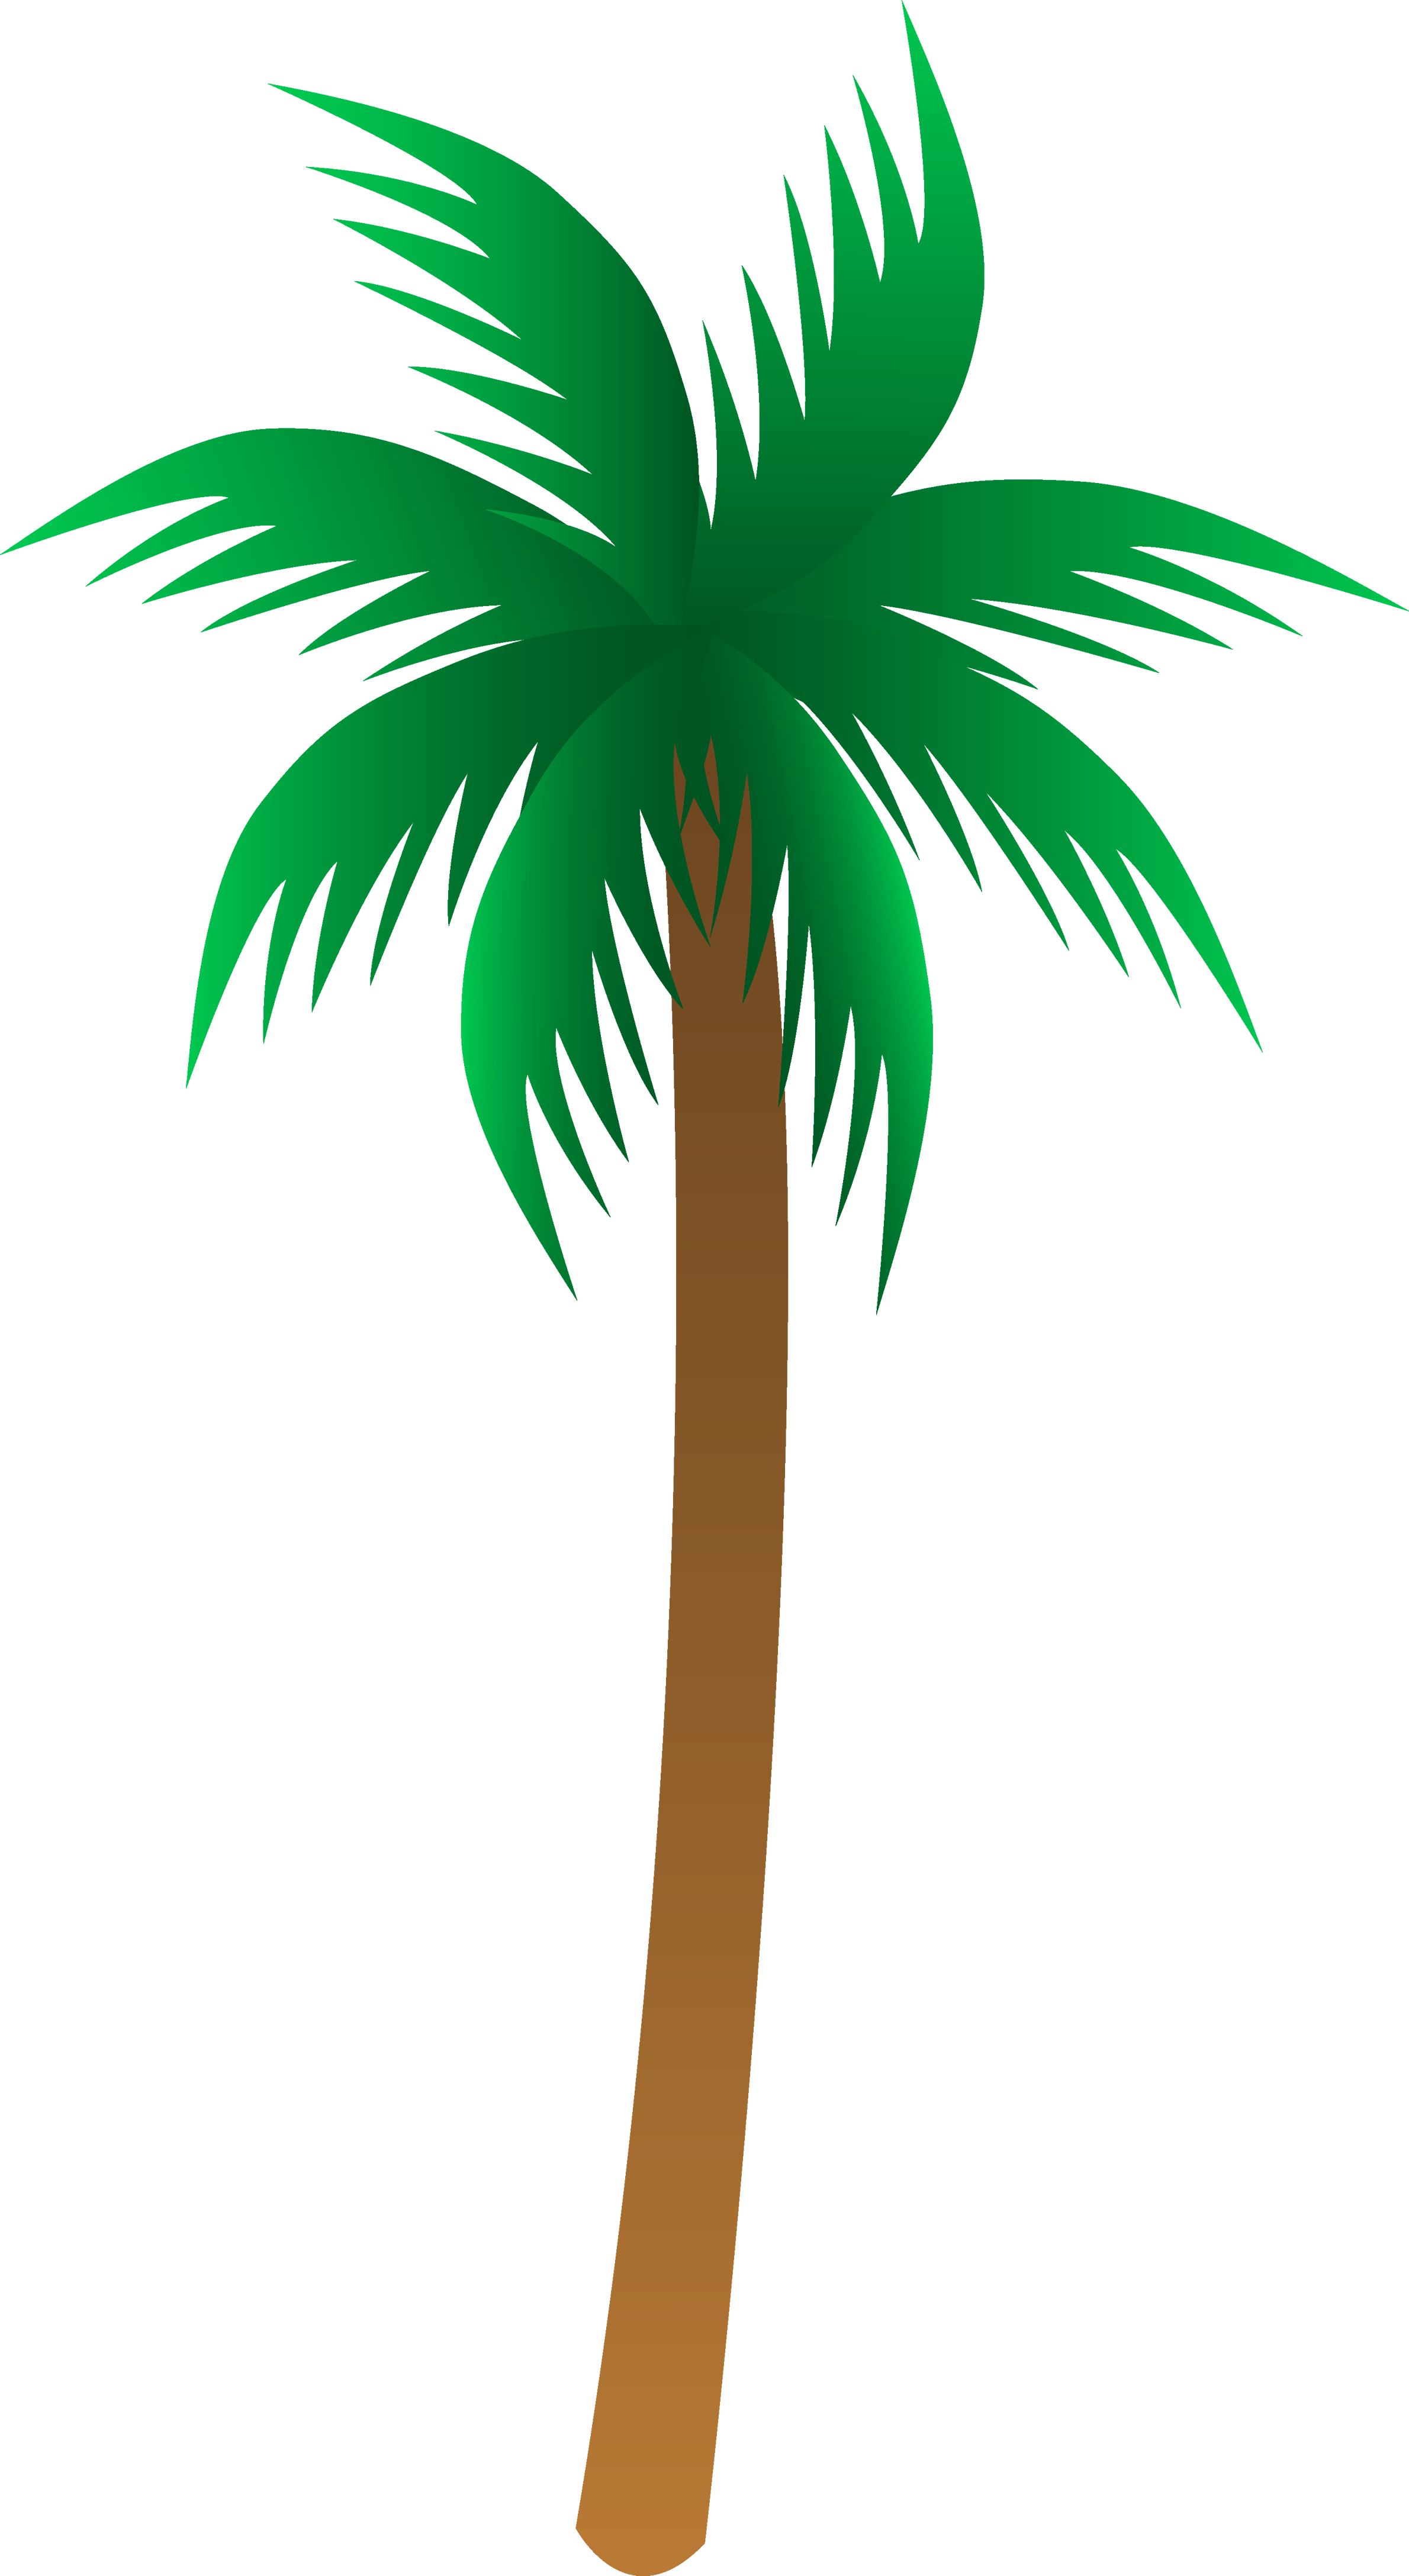 Palmtree Image Clipart Best